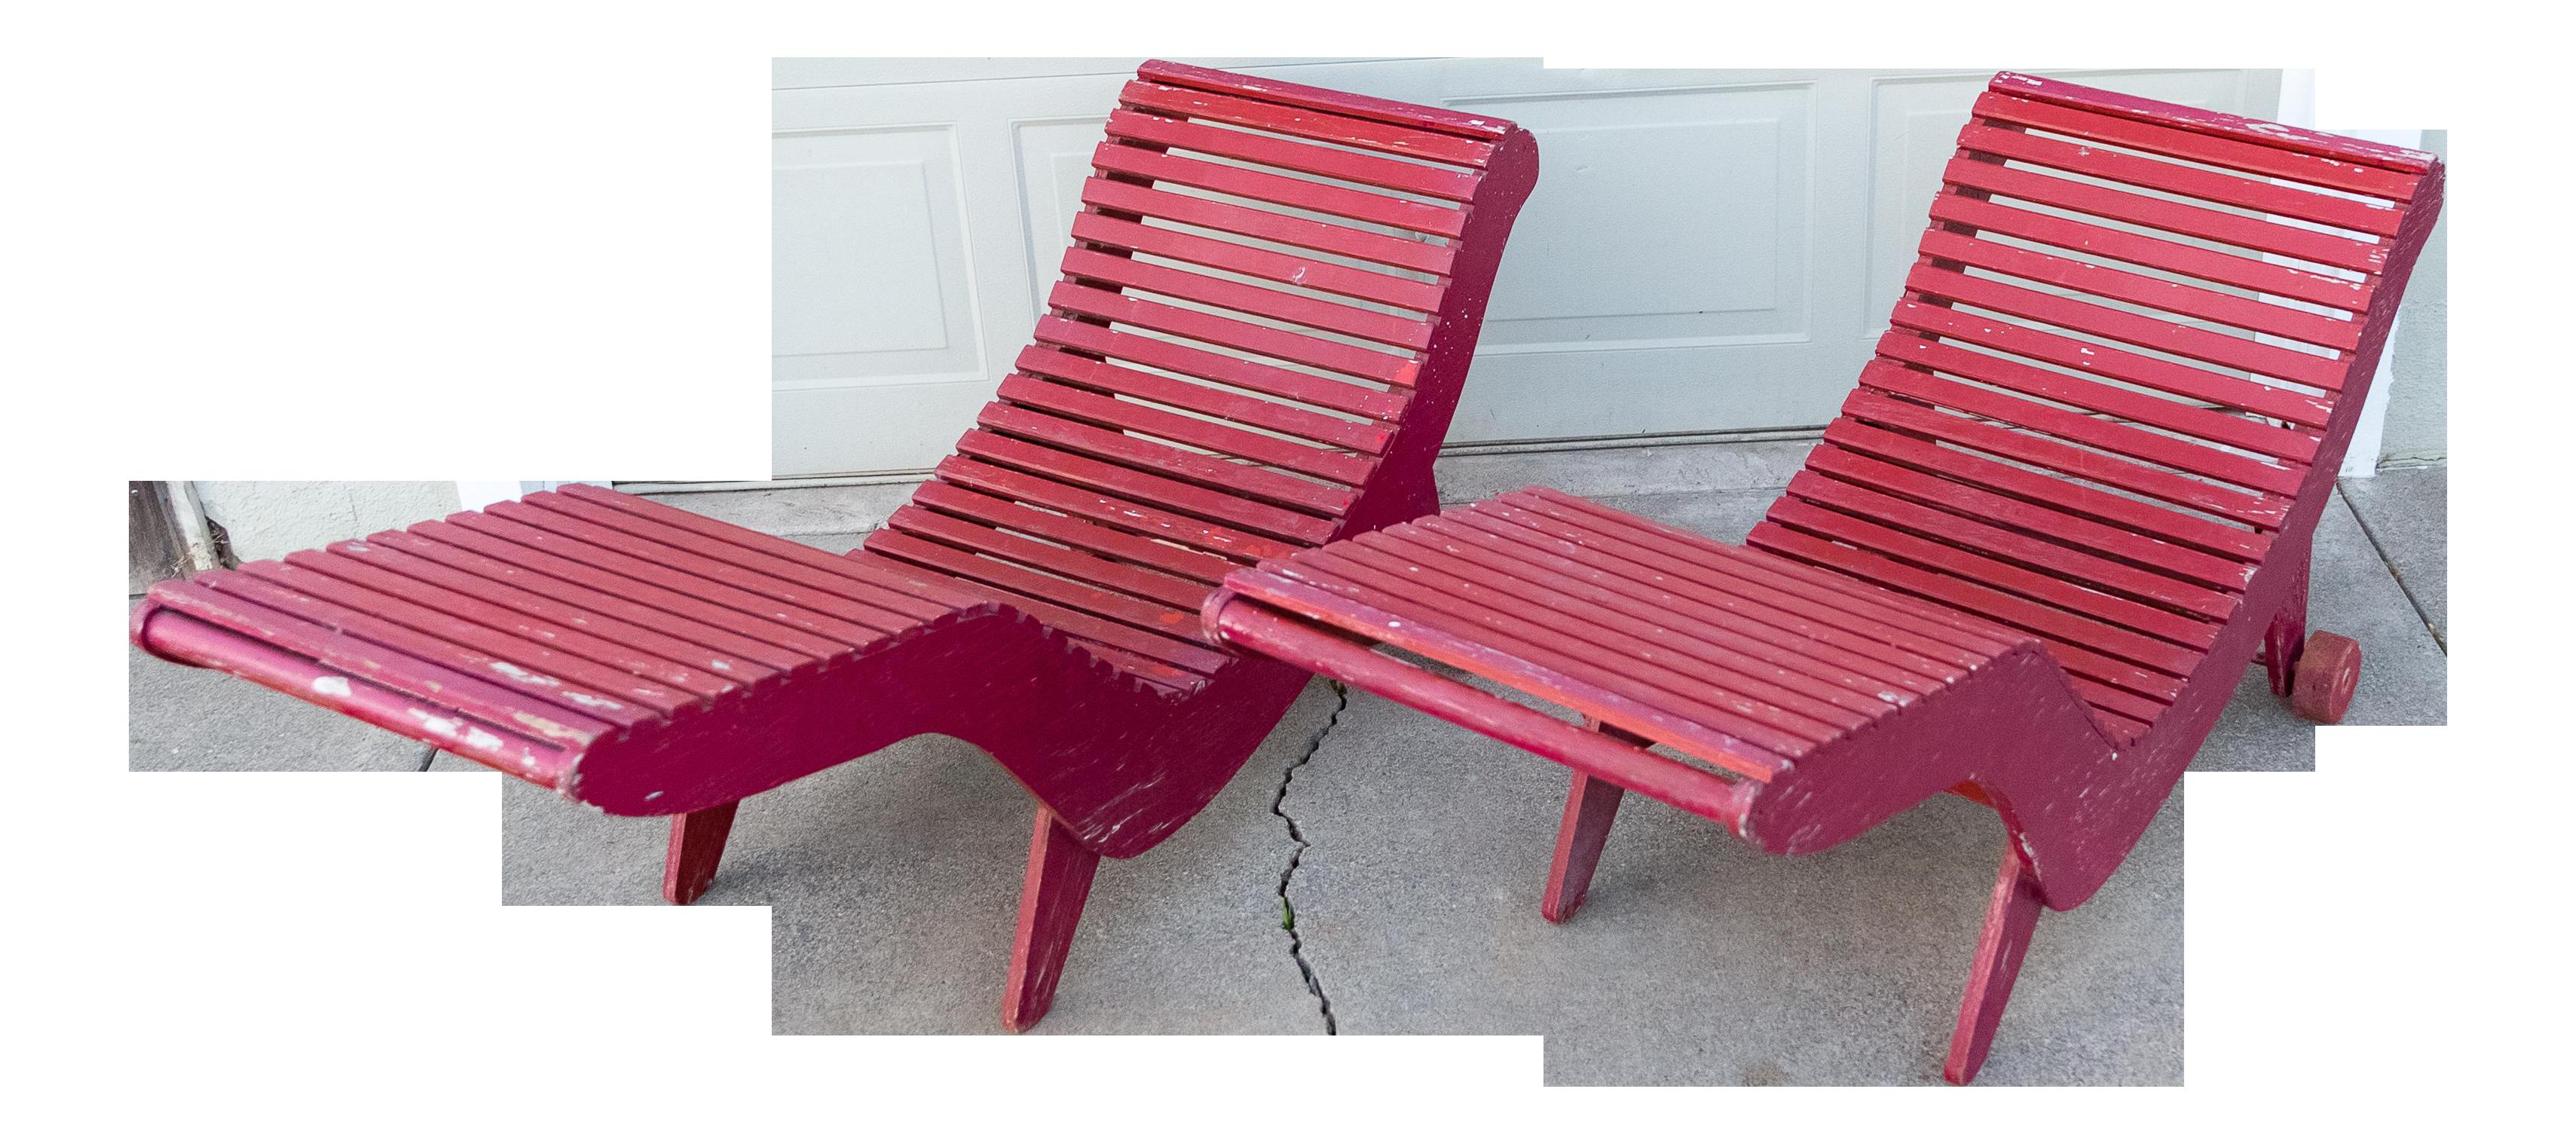 chaise matelasse trendy coussin de chaise matelass fidji. Black Bedroom Furniture Sets. Home Design Ideas